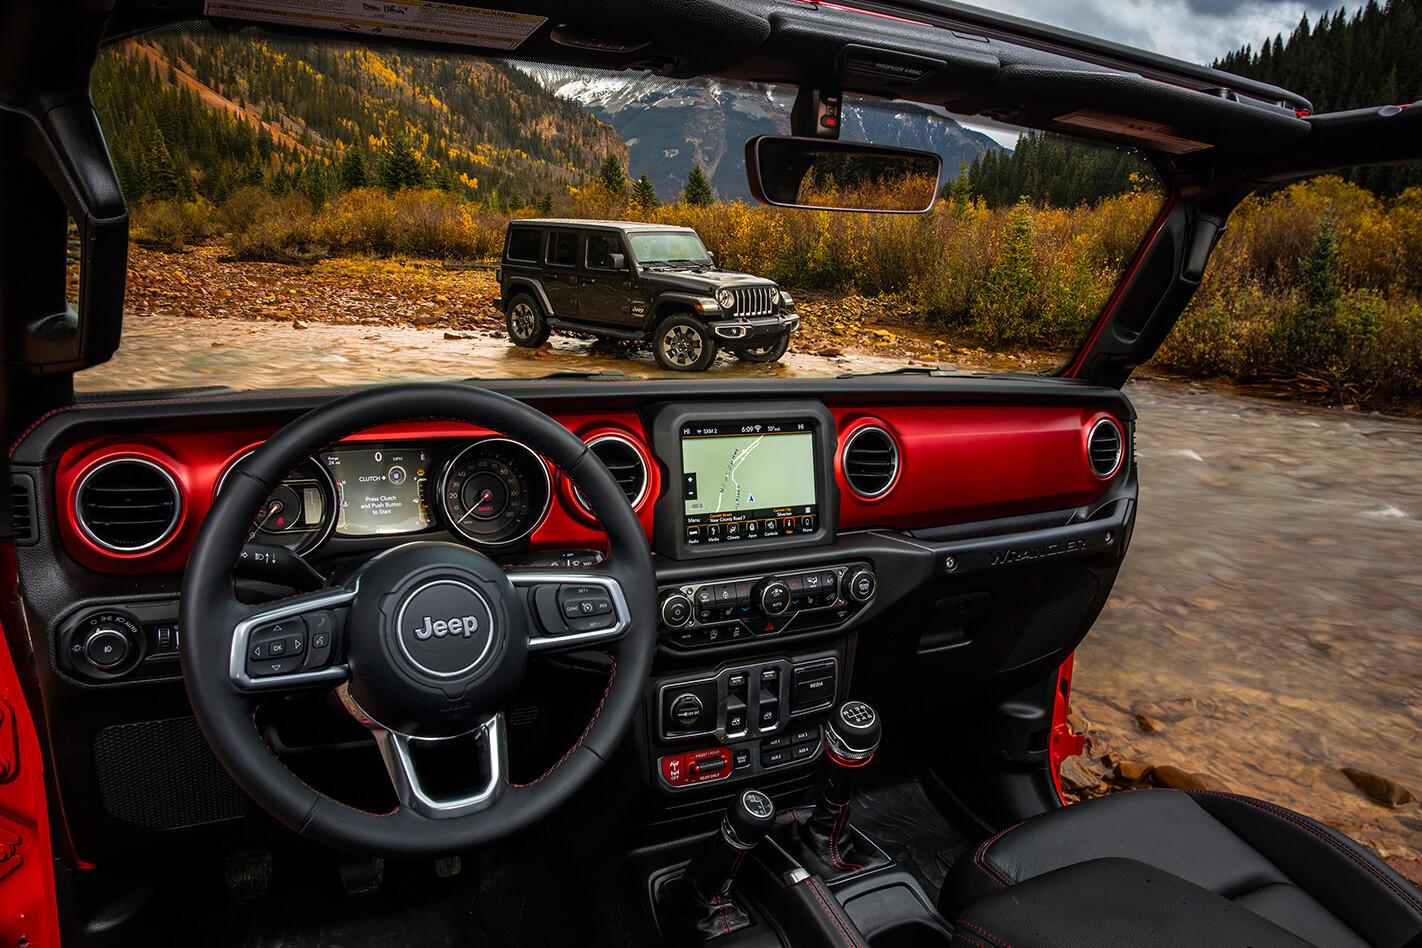 2018-Jeep-Wrangler-interior.jpg